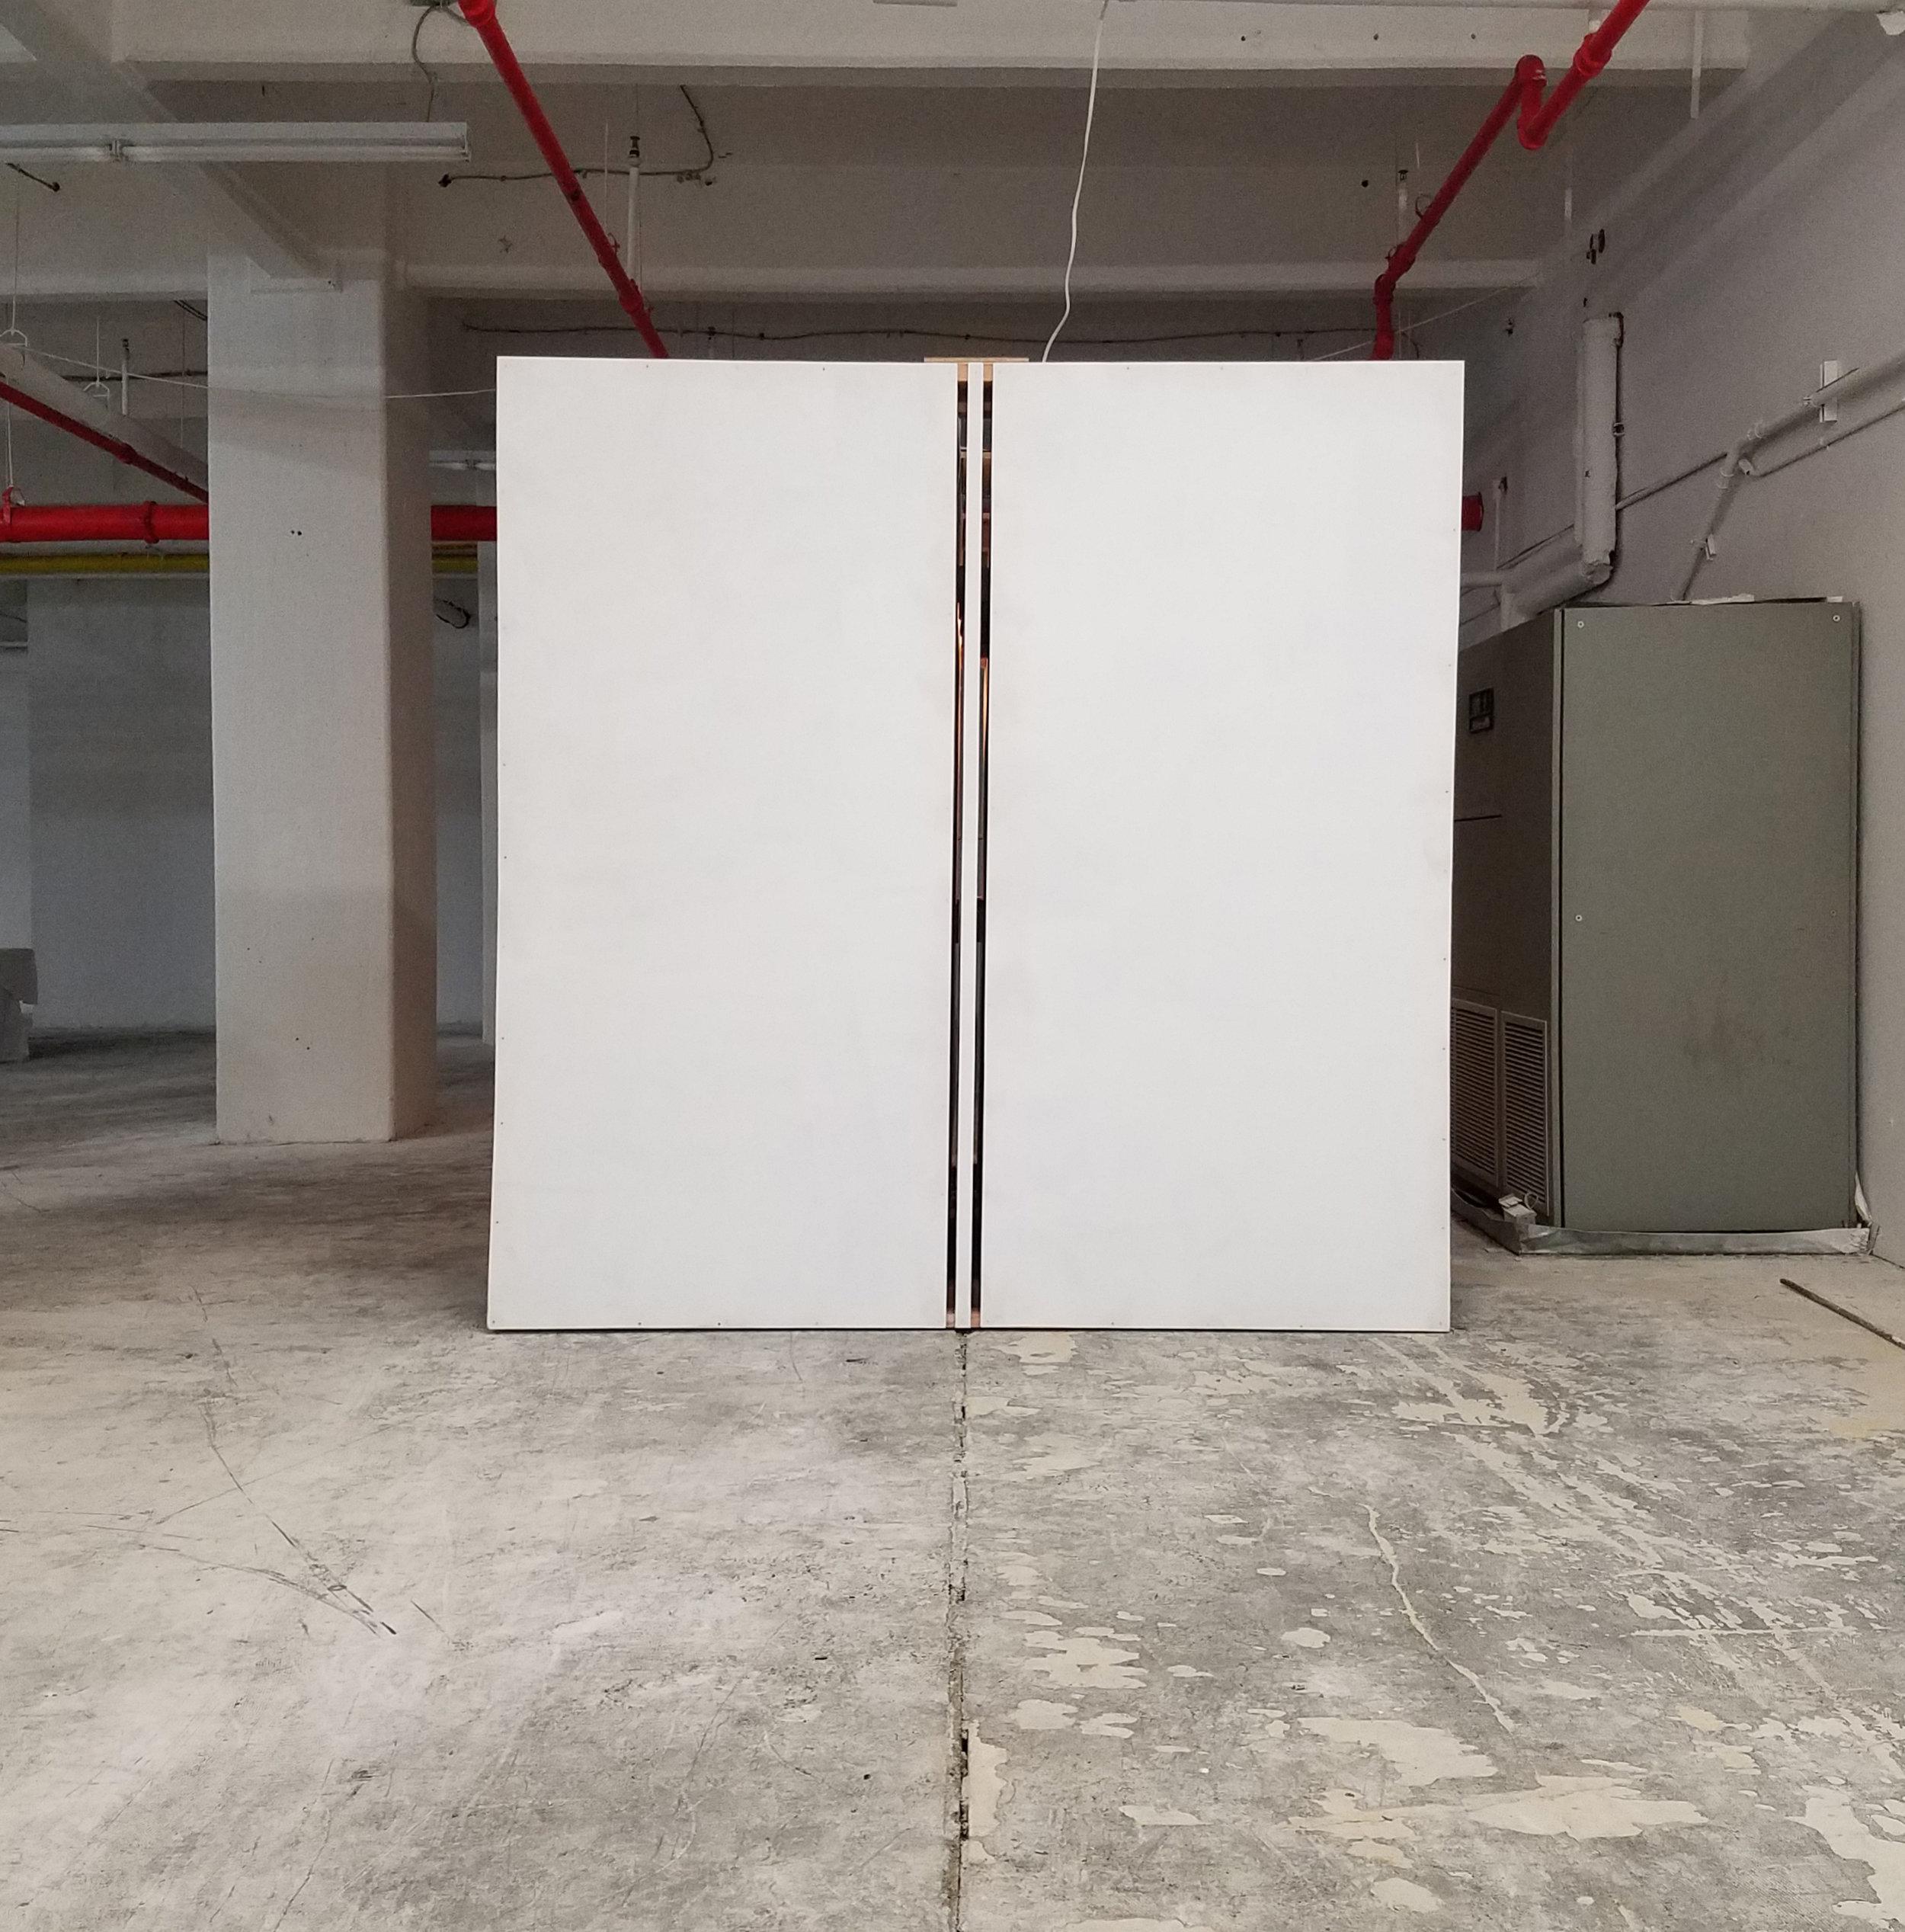 "Parallax 6   2×4s, plywood, paint, found objects 2017 96"" × 96""× 96"" Derek Frankhouser"